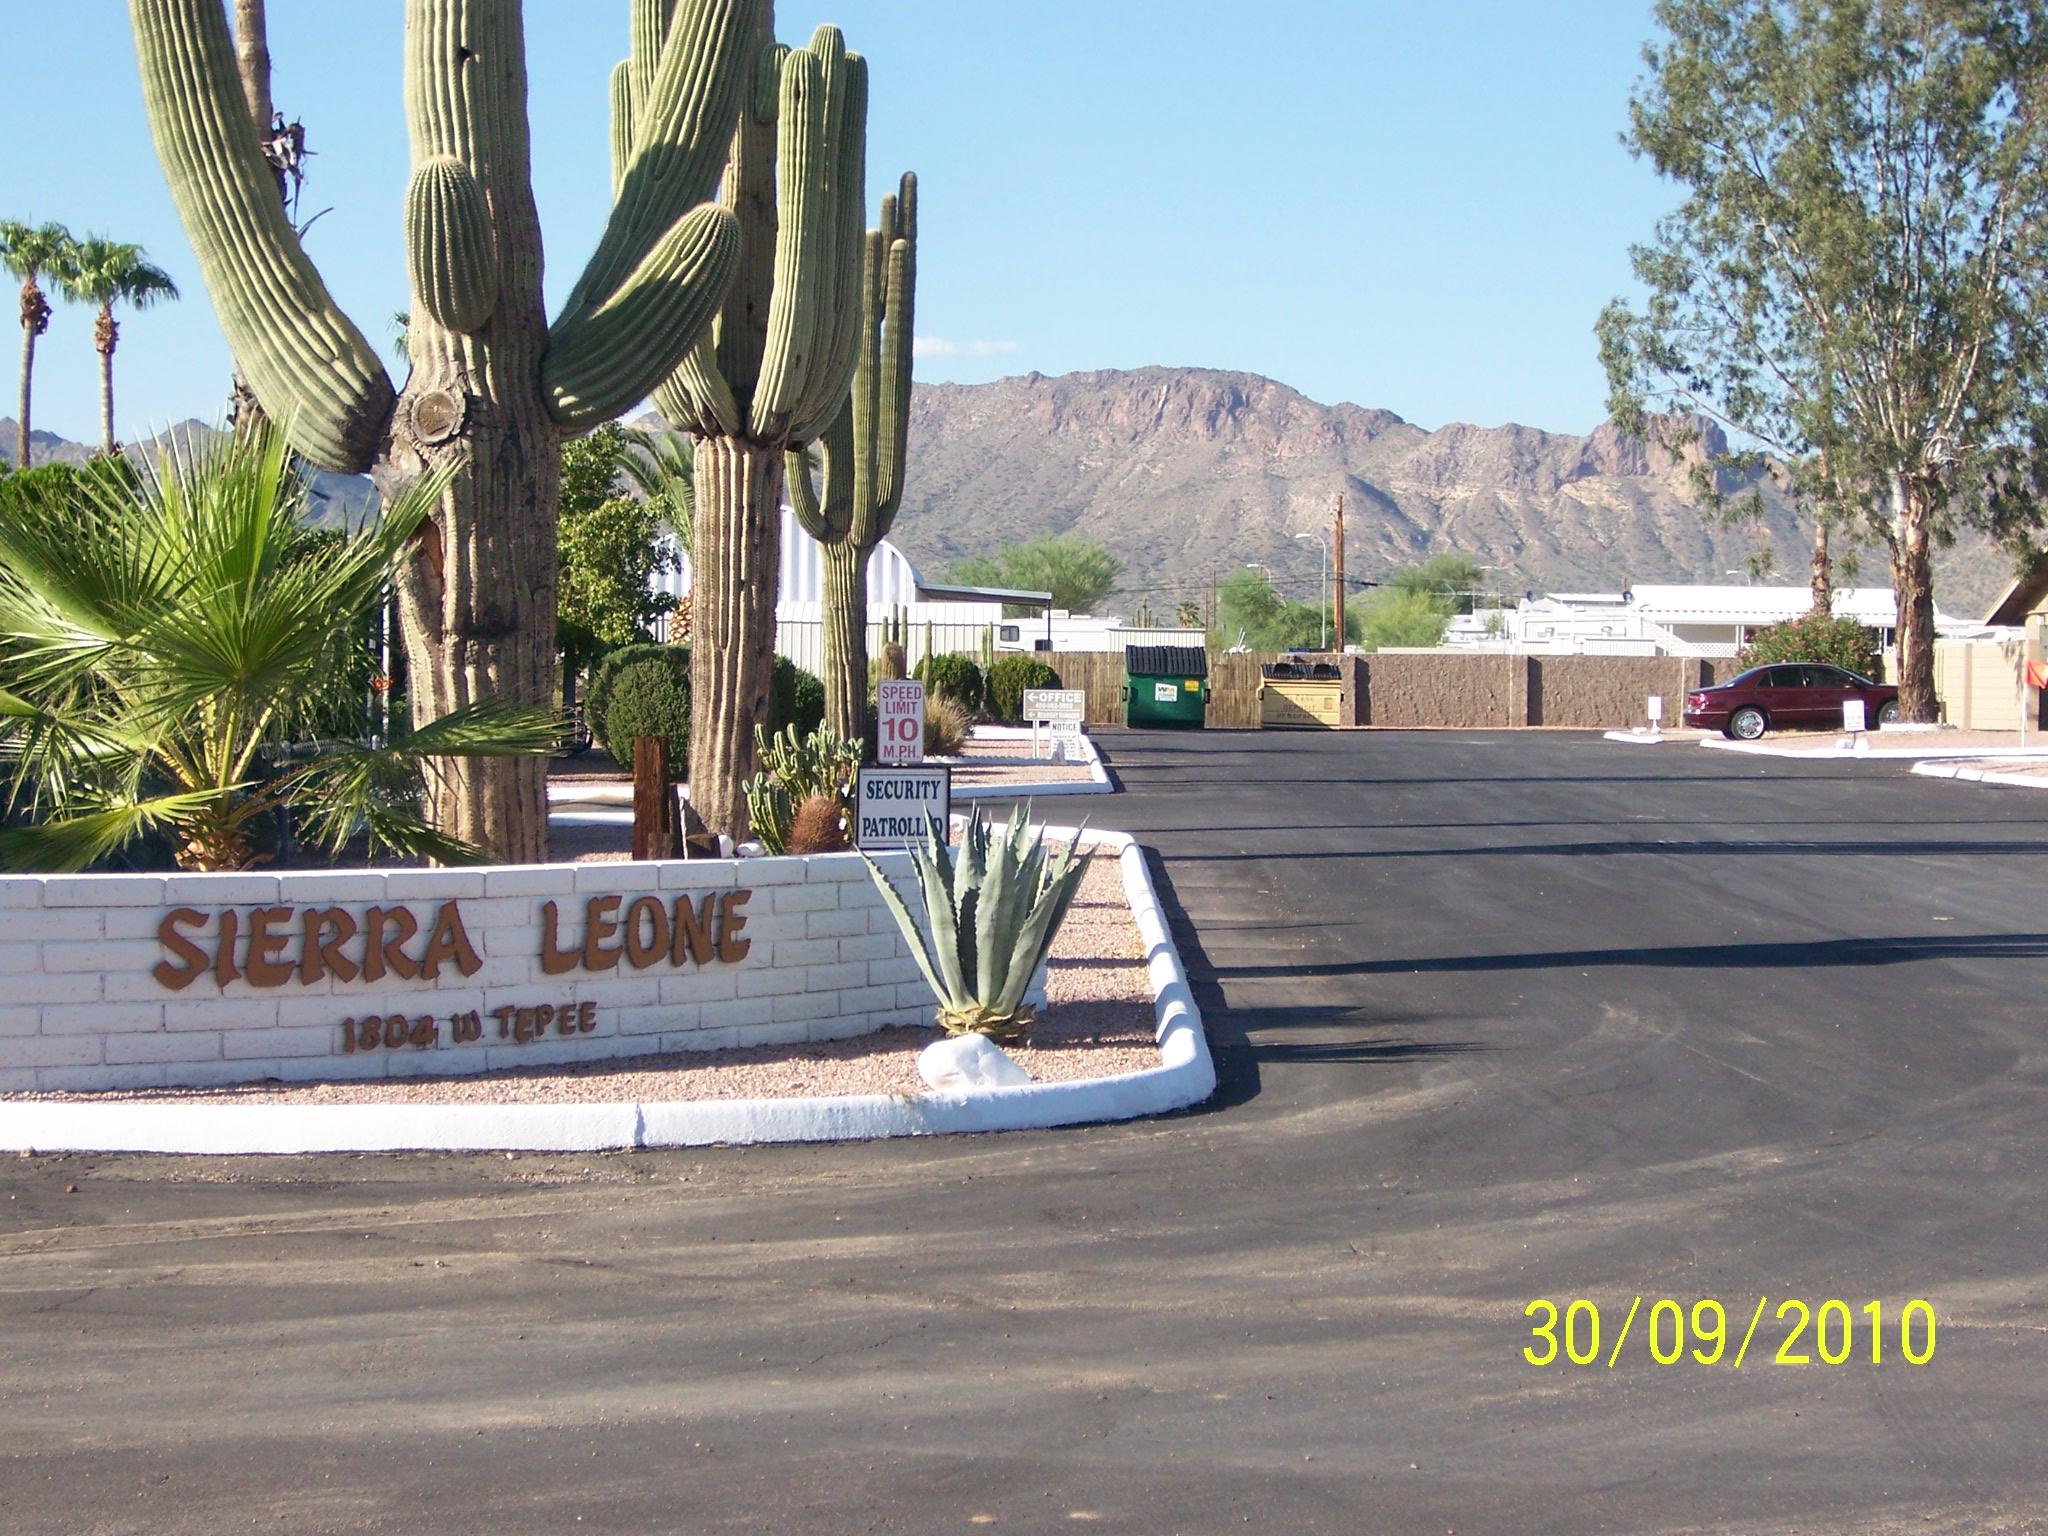 Sierra Leone RV And Mobile Home Park Apache Junction AZ 85120